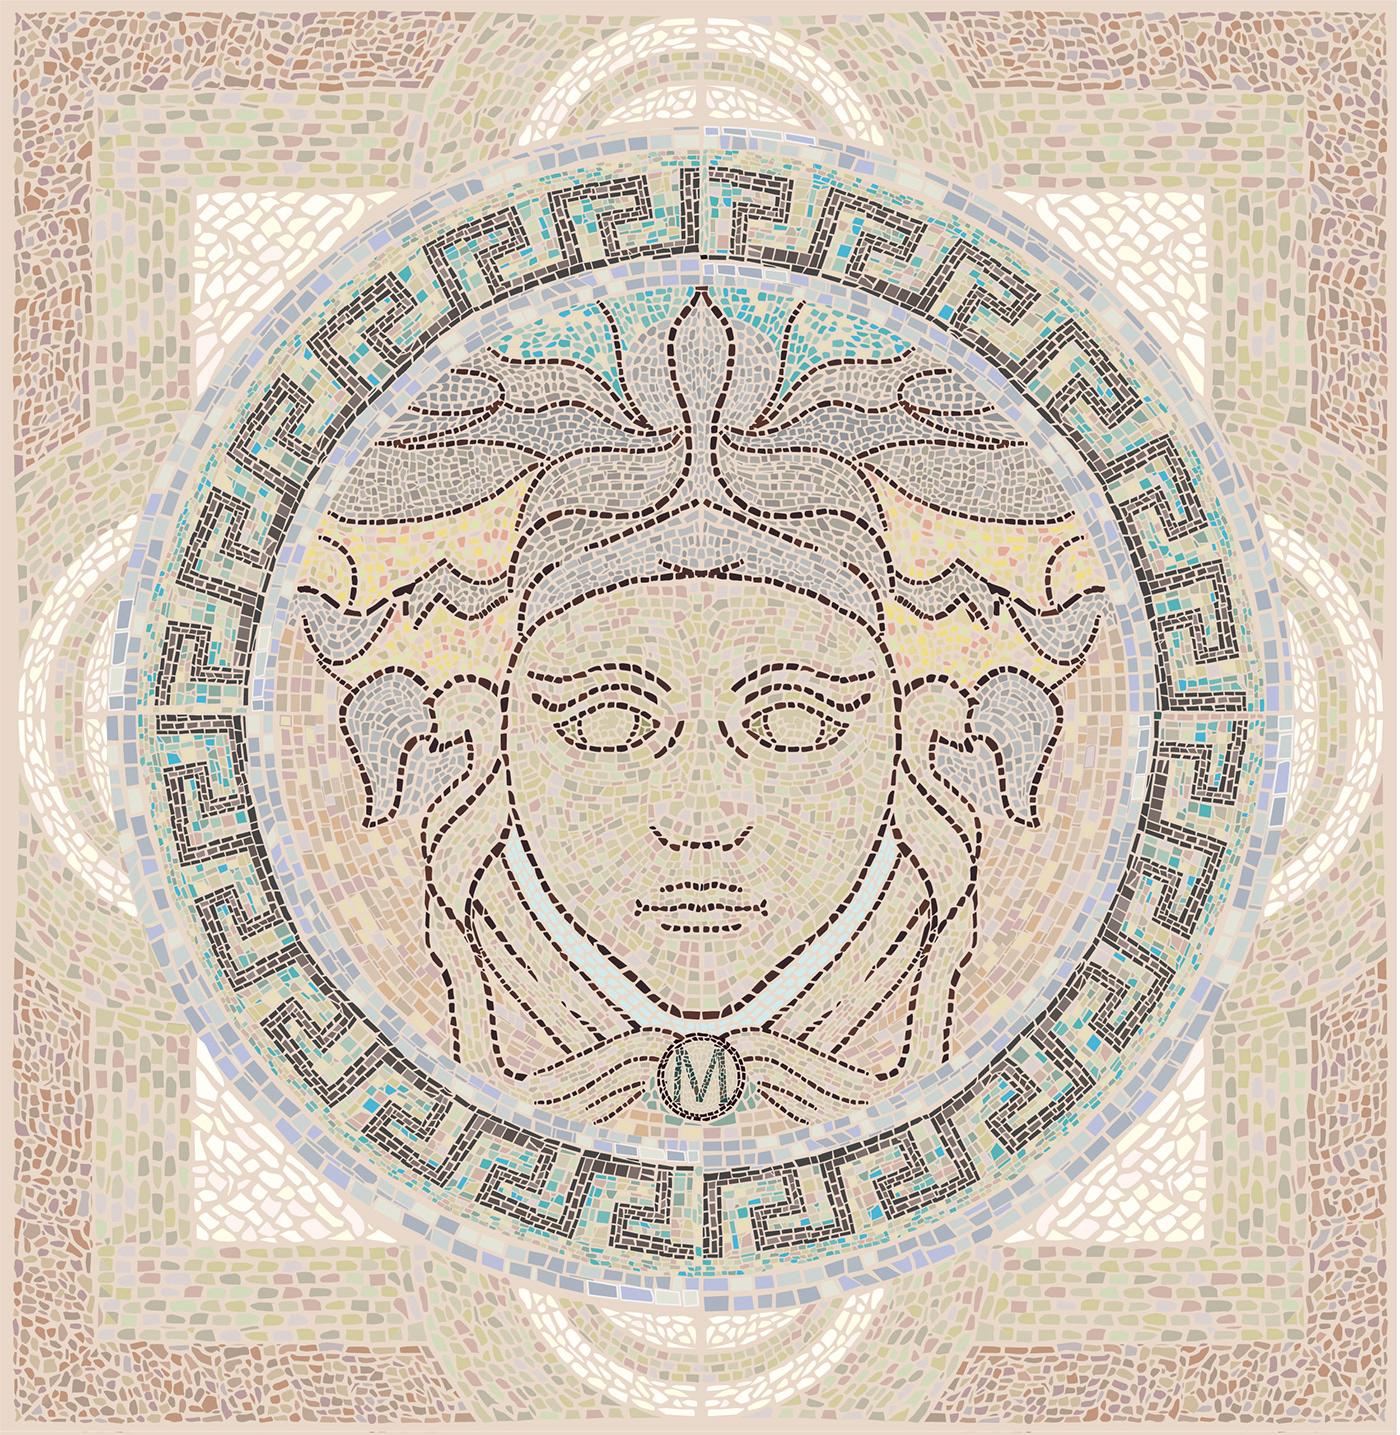 Image may contain: drawing and human face